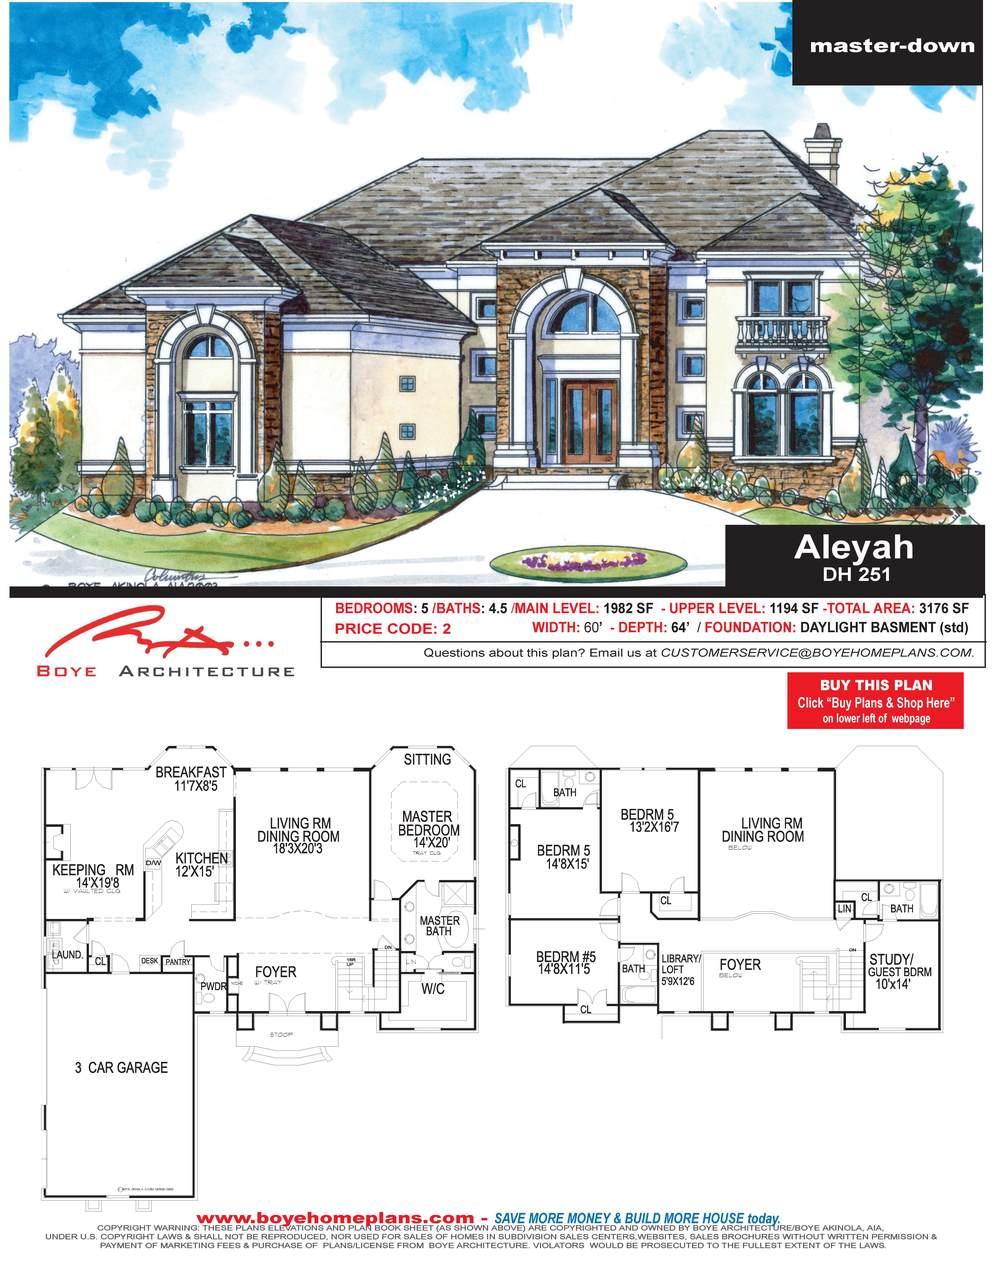 ALEYAH PLAN PAGE-DH251-122809.jpg